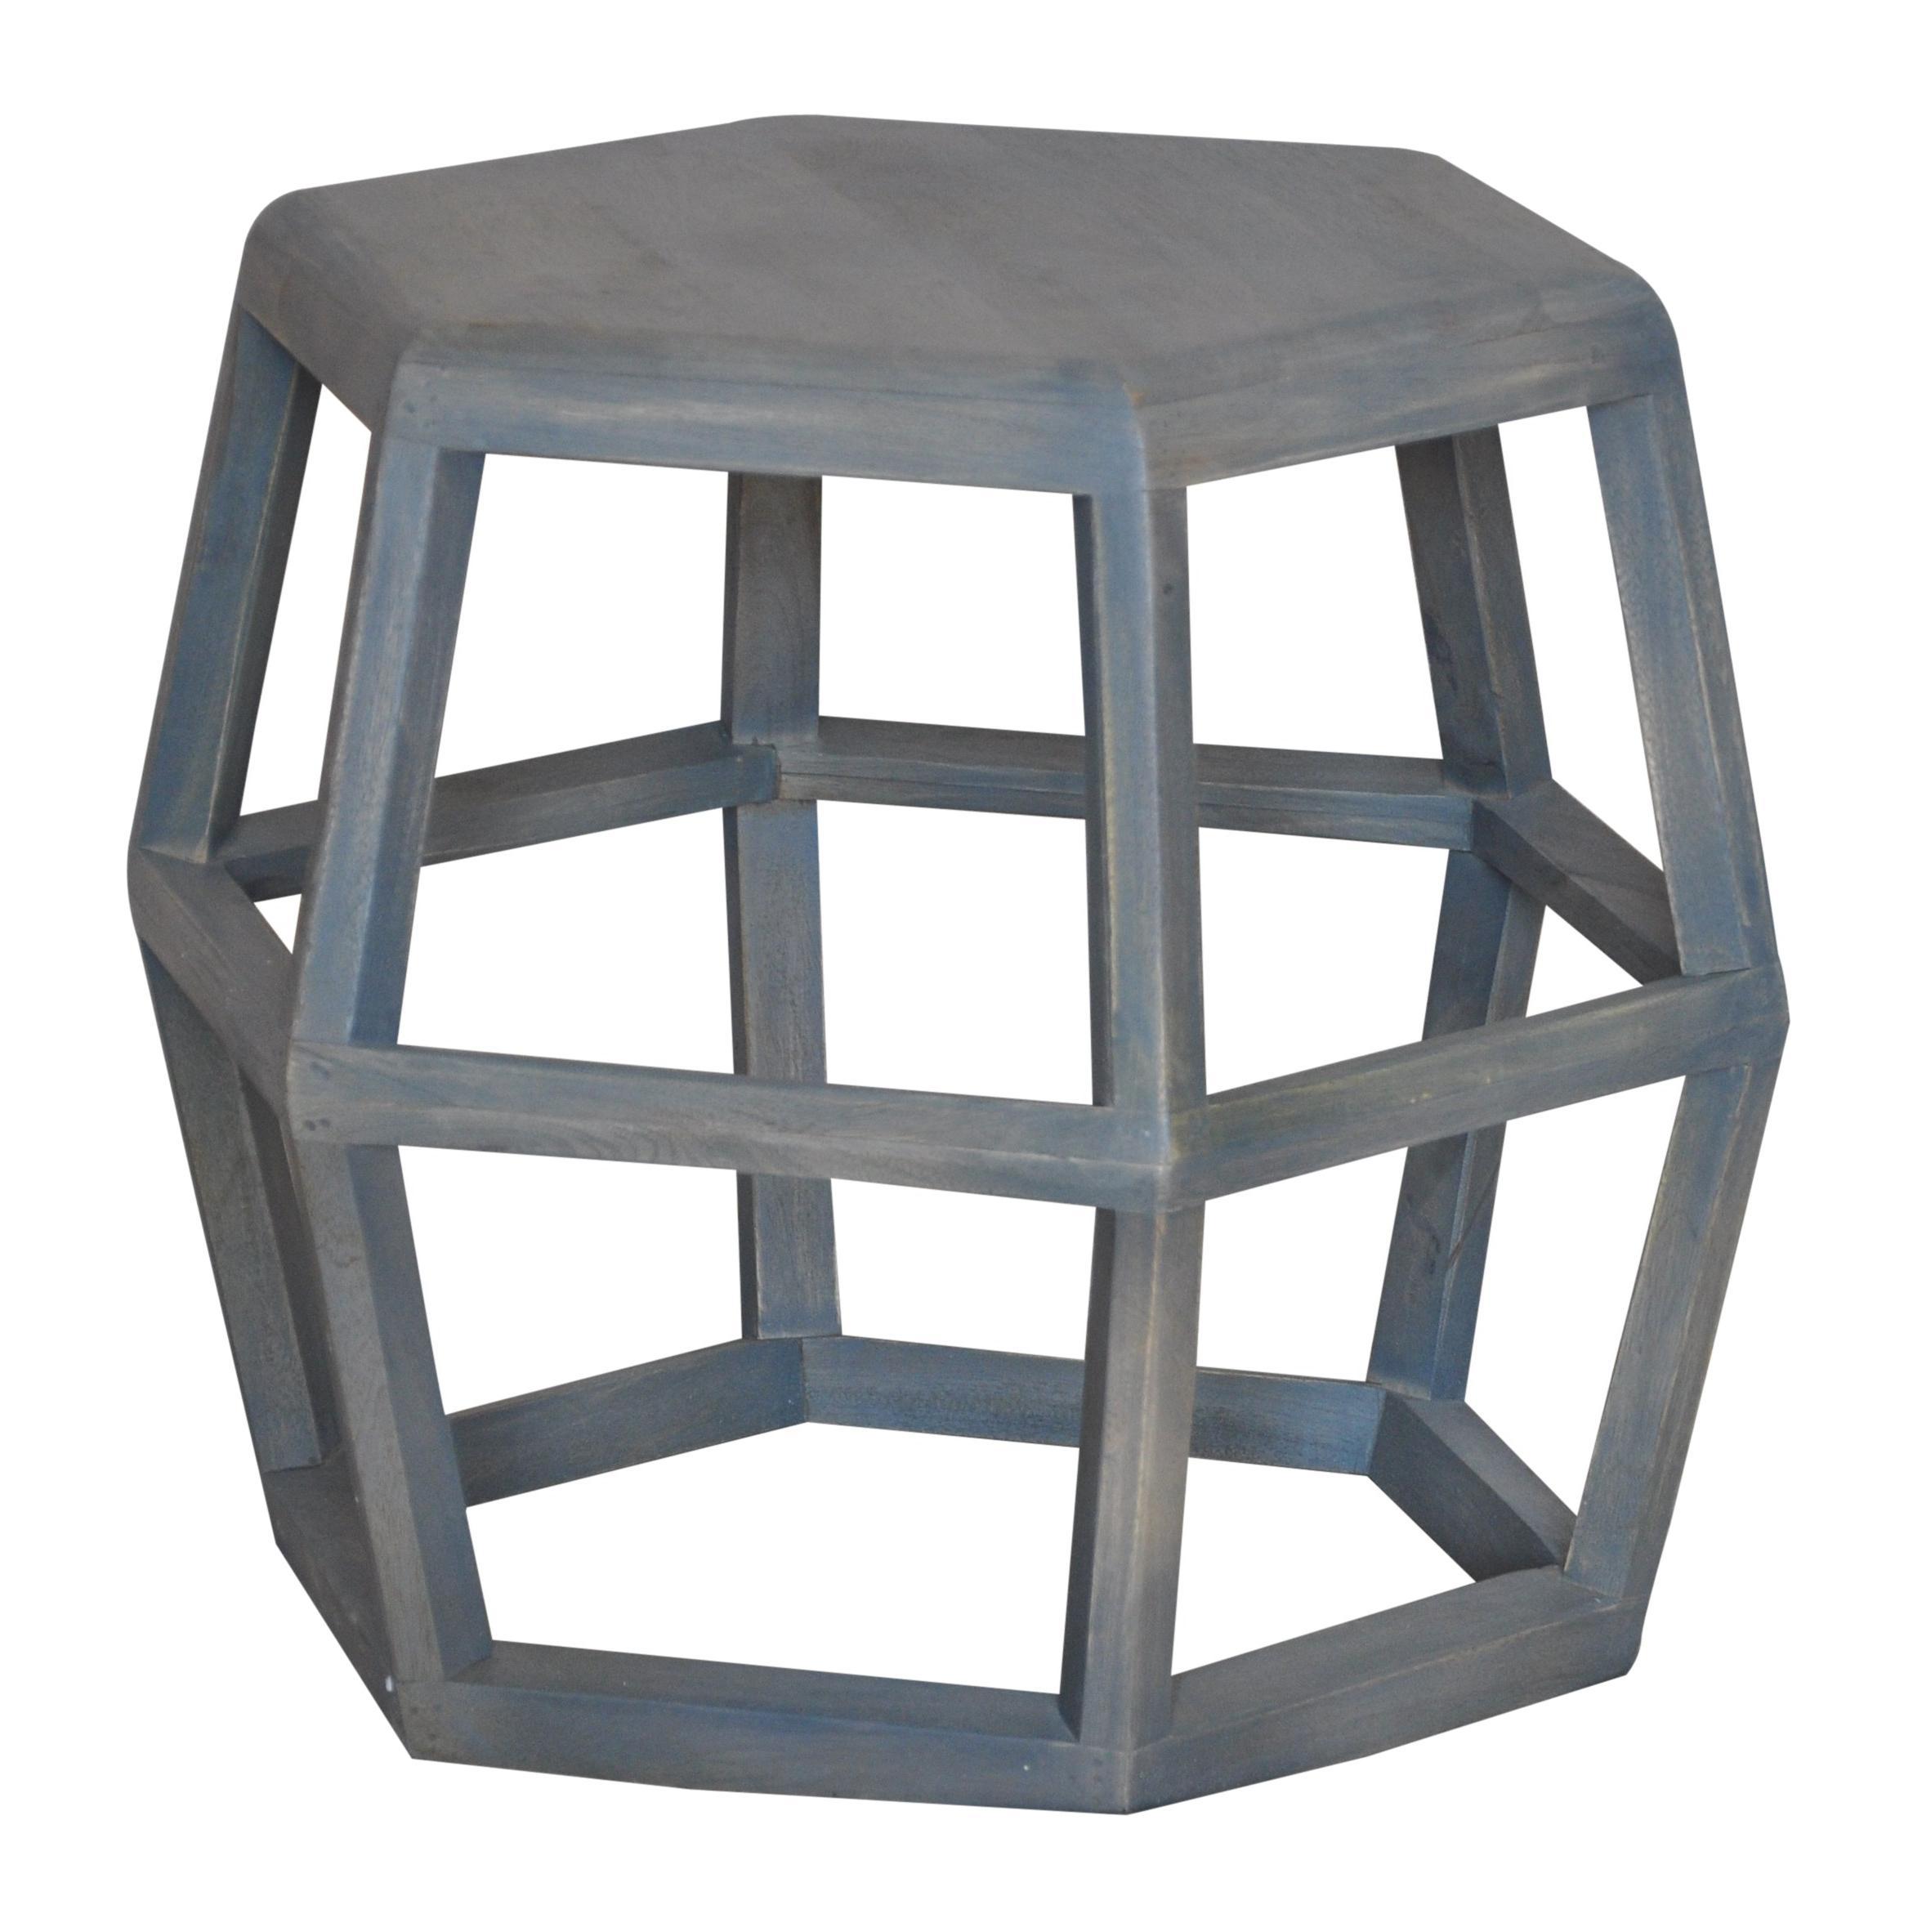 Jaipur furniture neemrana geometric lamp table with modern industrial style